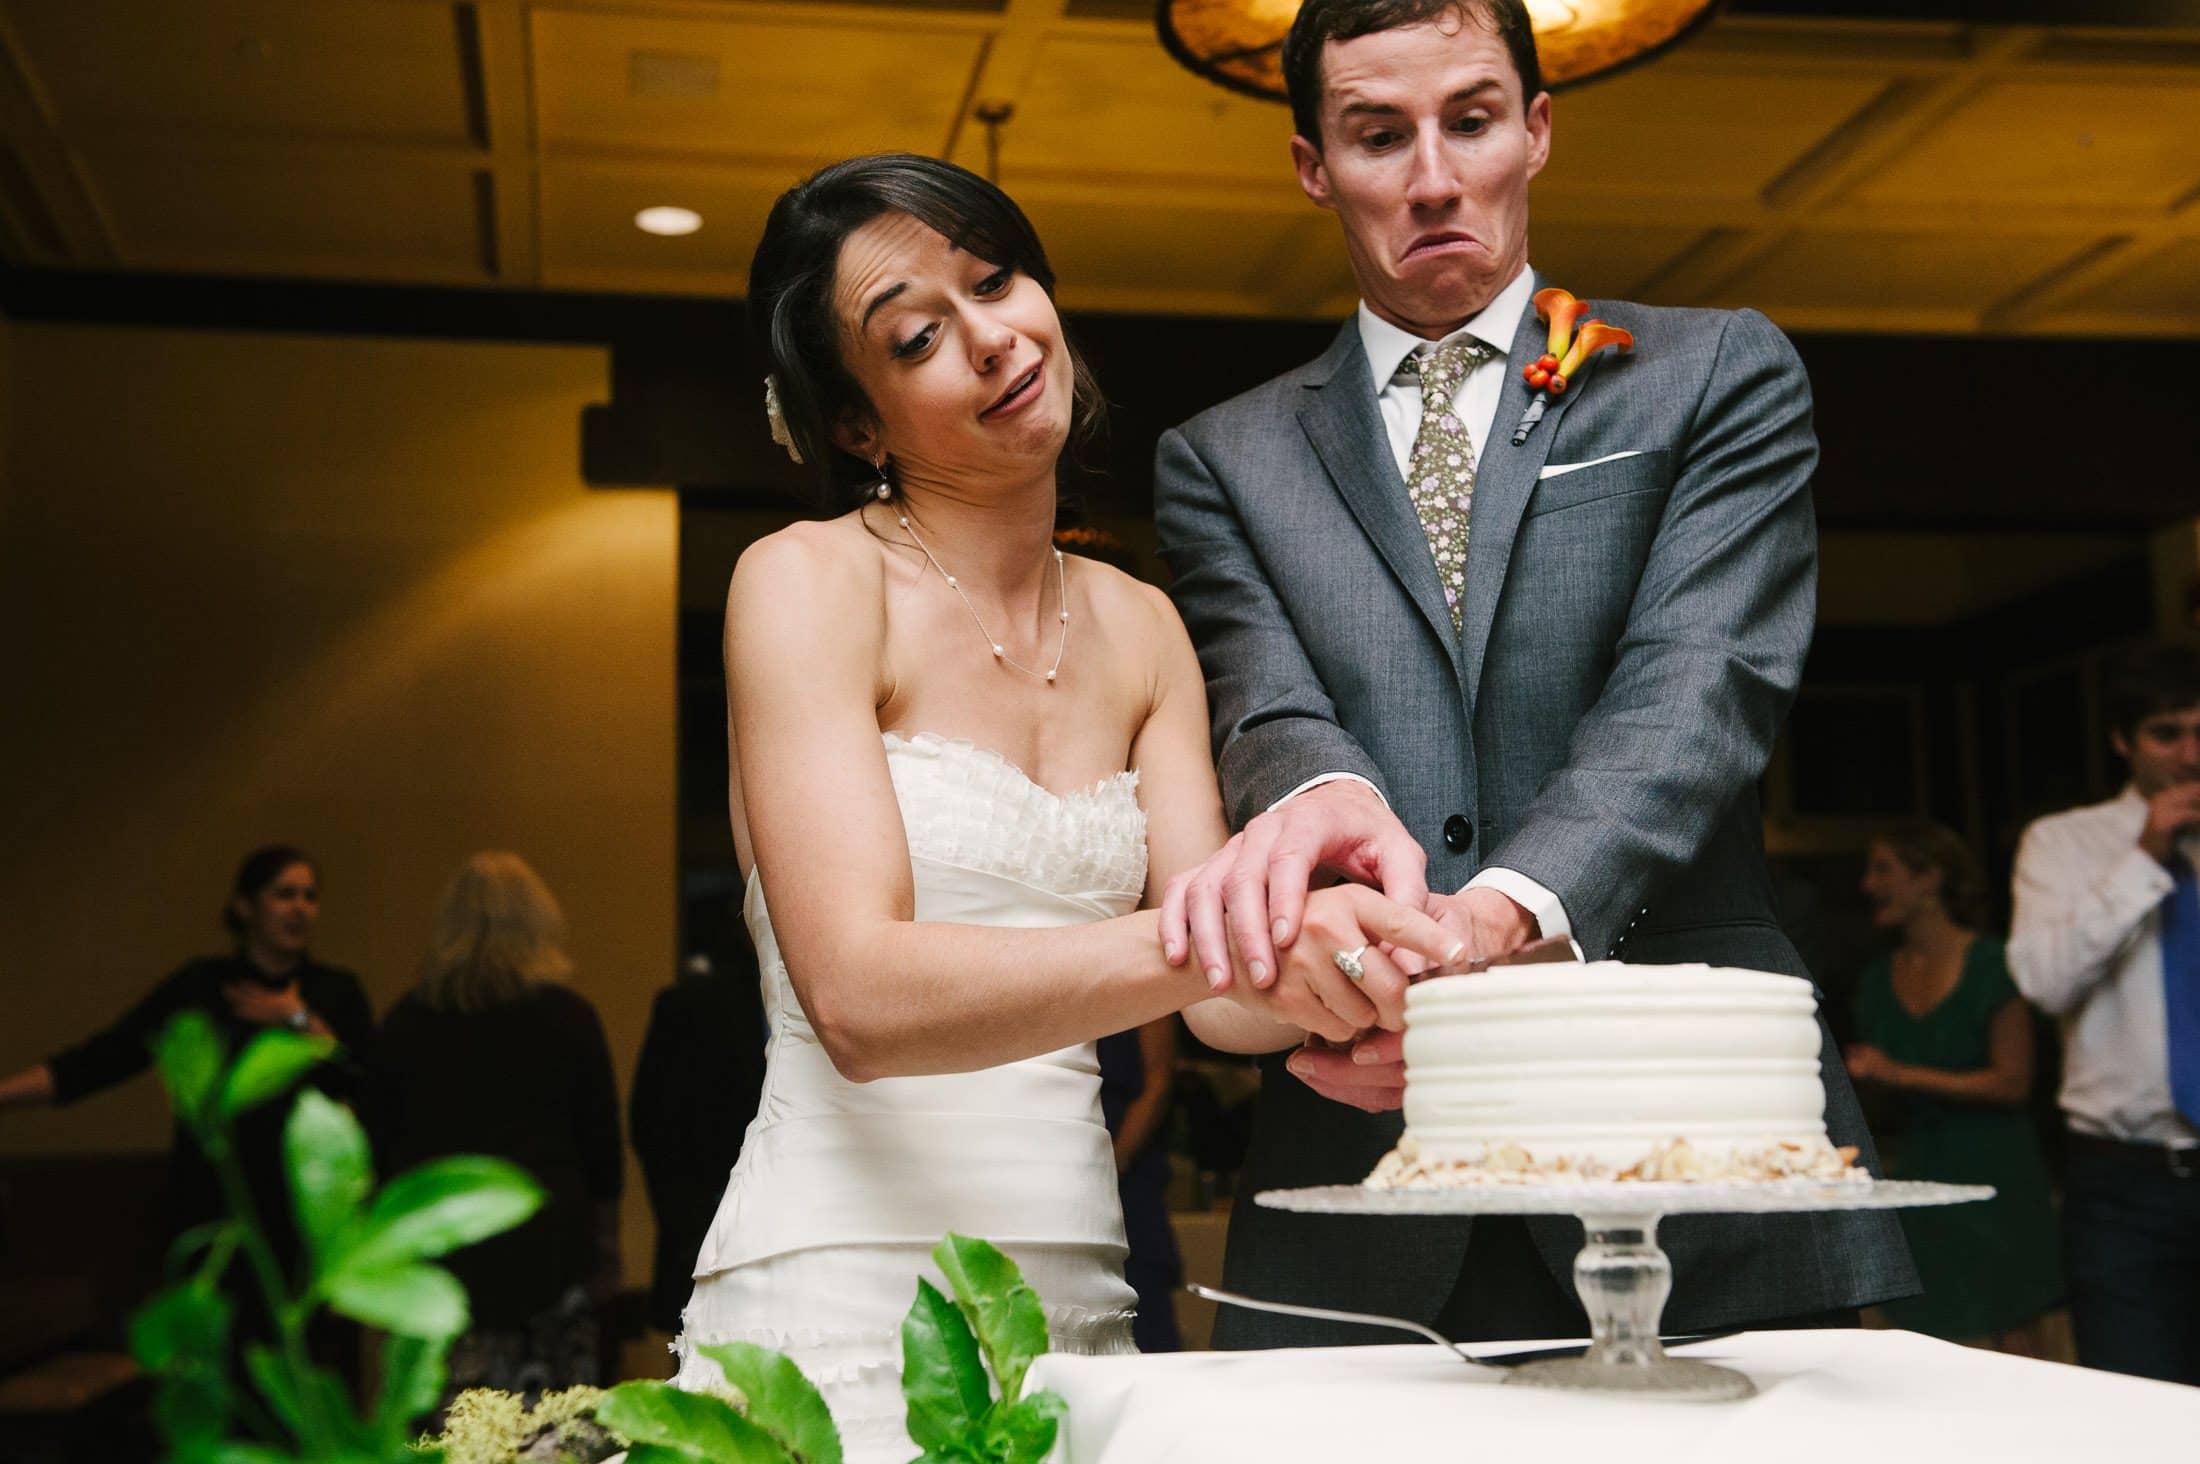 Fun cake cutting at berkeley wedding